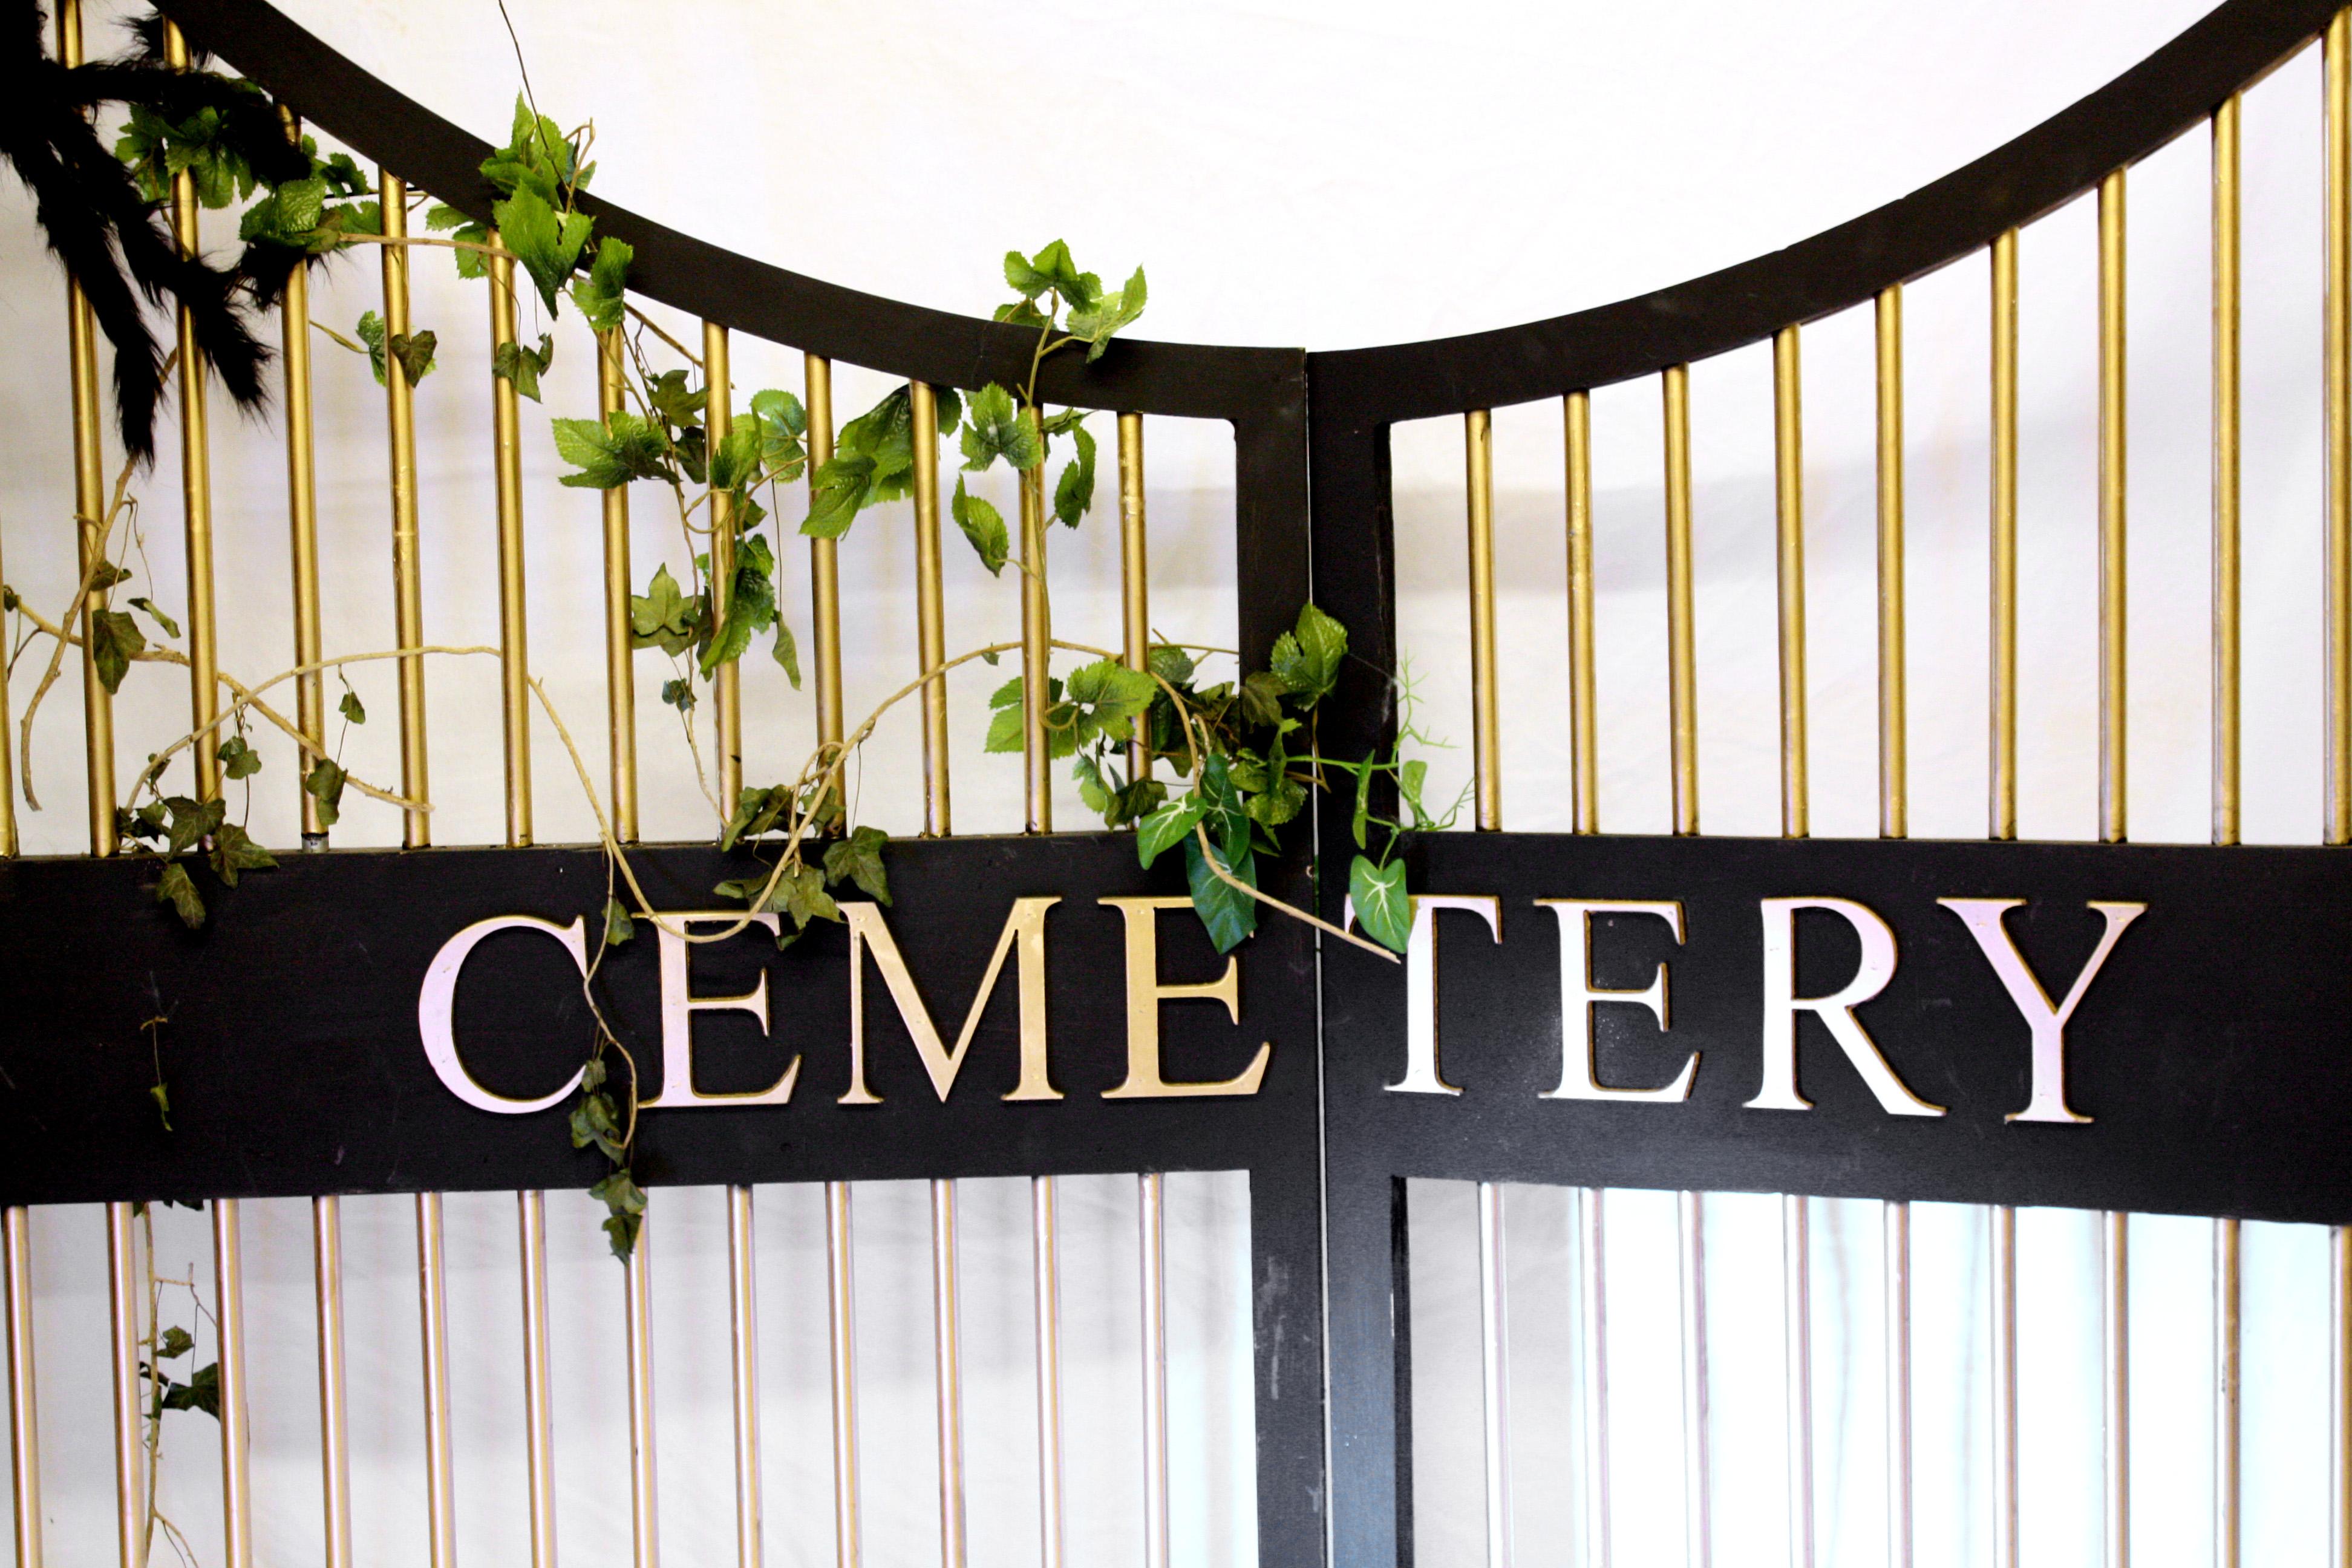 Gate clipart cemetery gates Gates hire cemetery prop